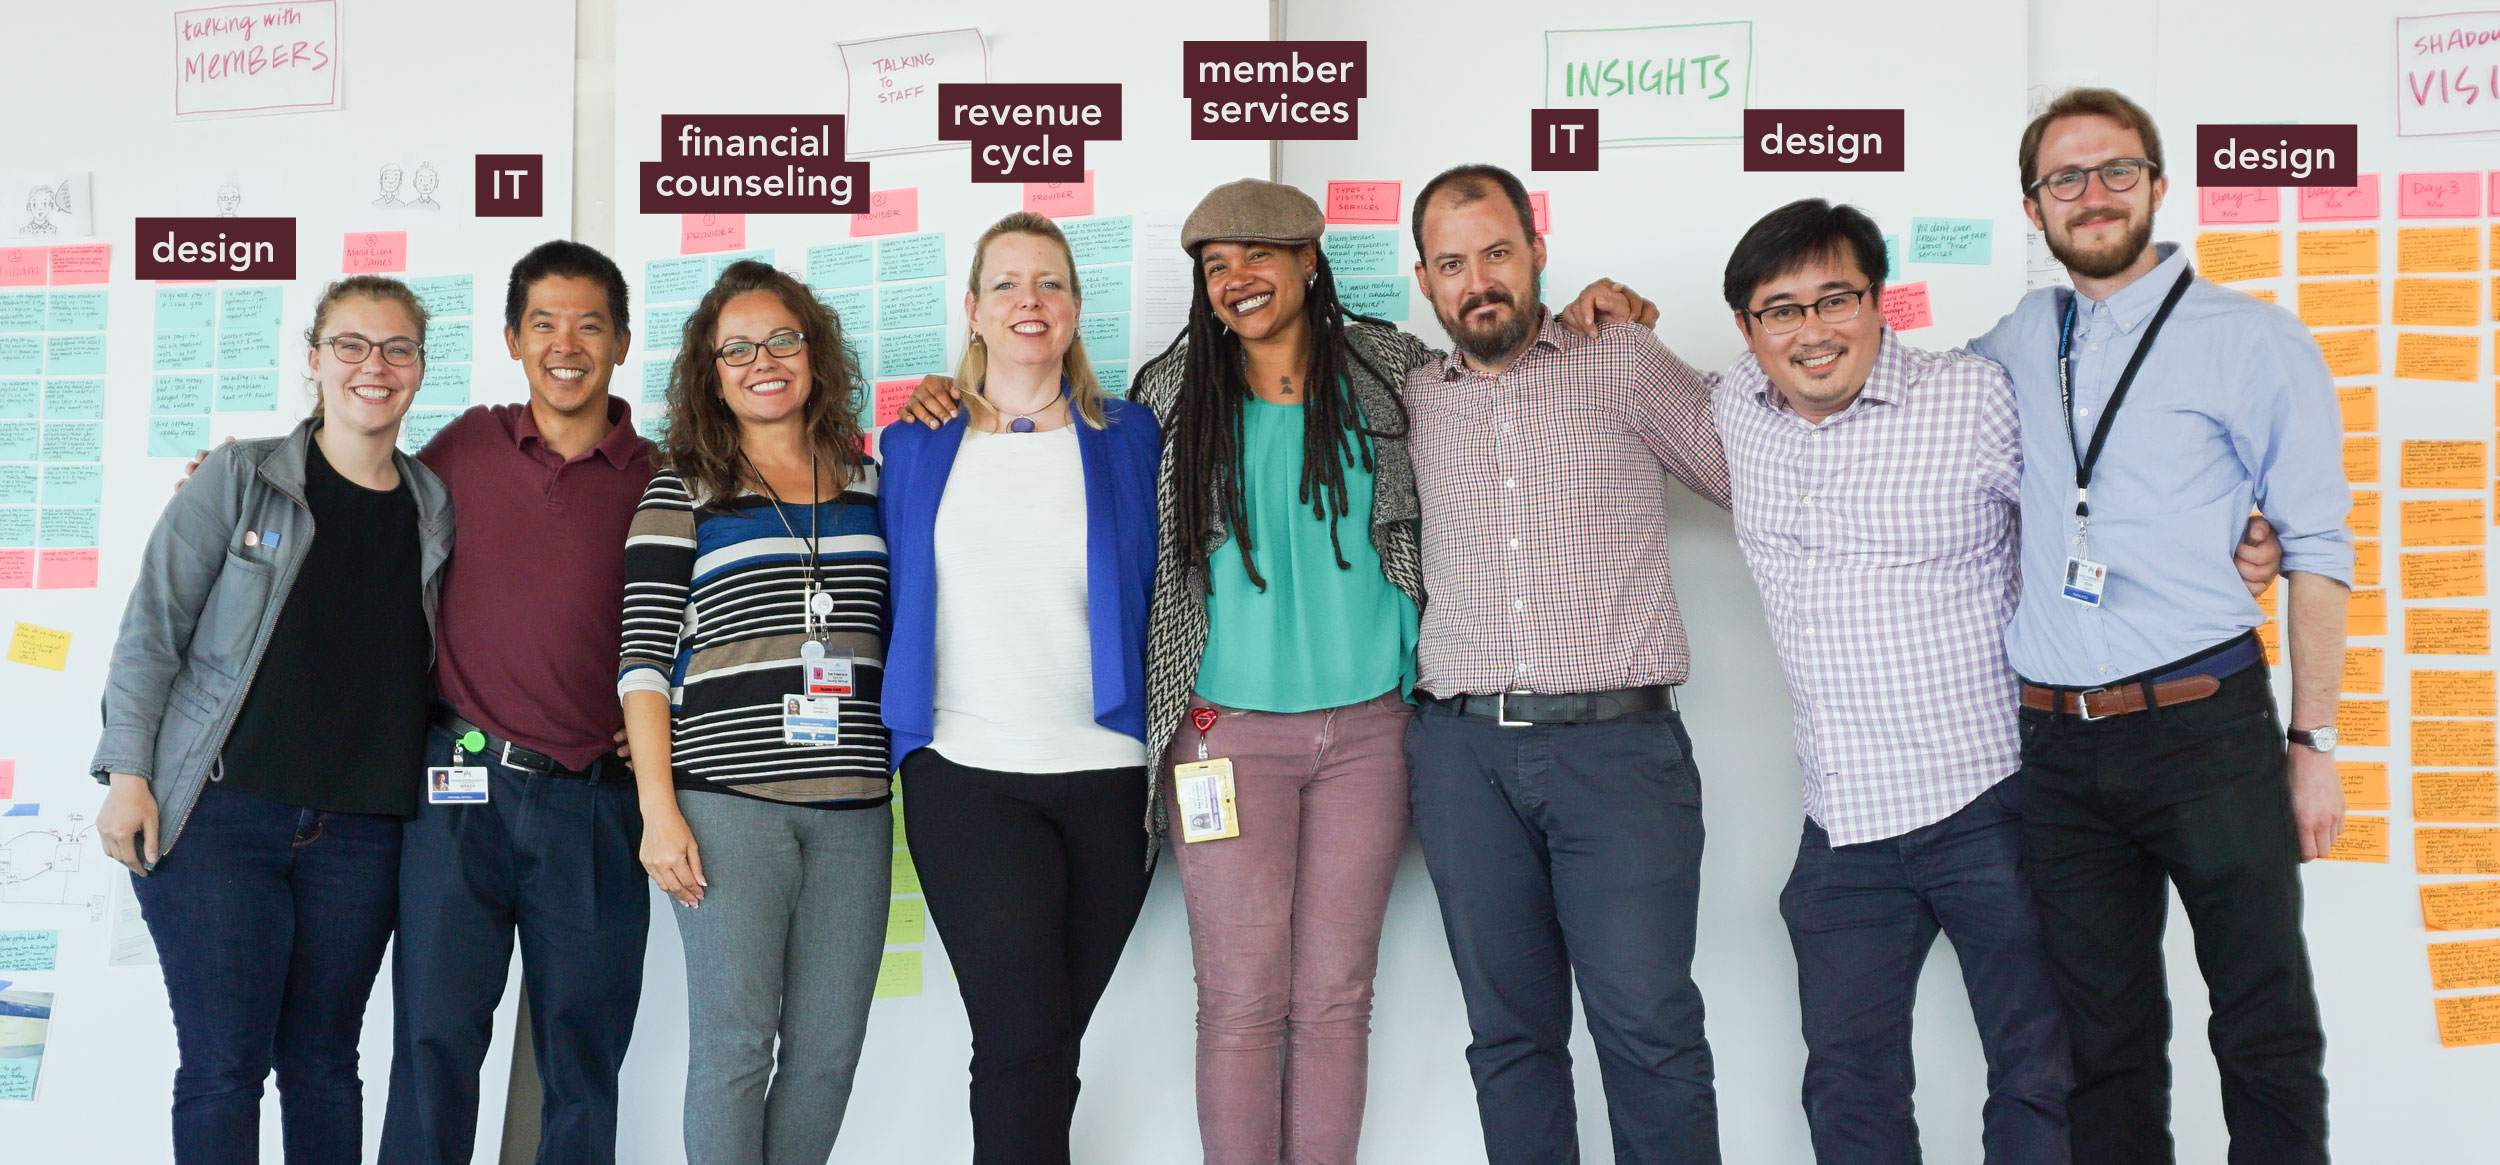 Our multi-disciplinary project design team